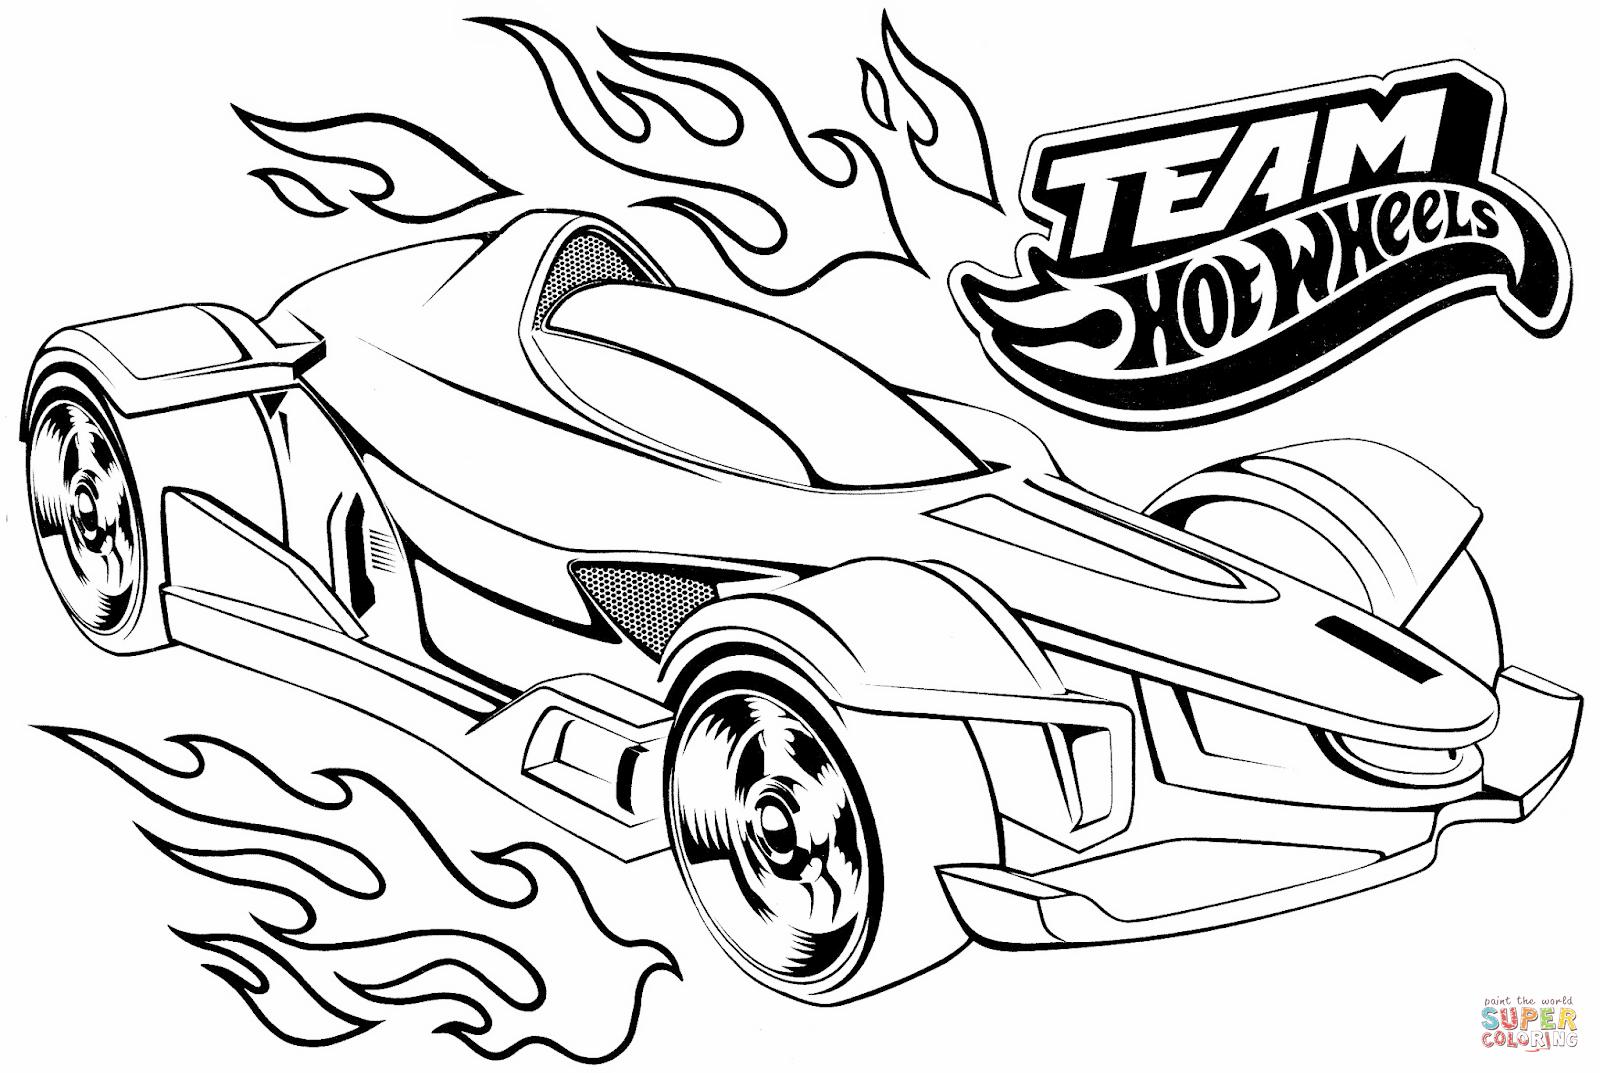 Desenho De Team Hot Wheels Para Colorir